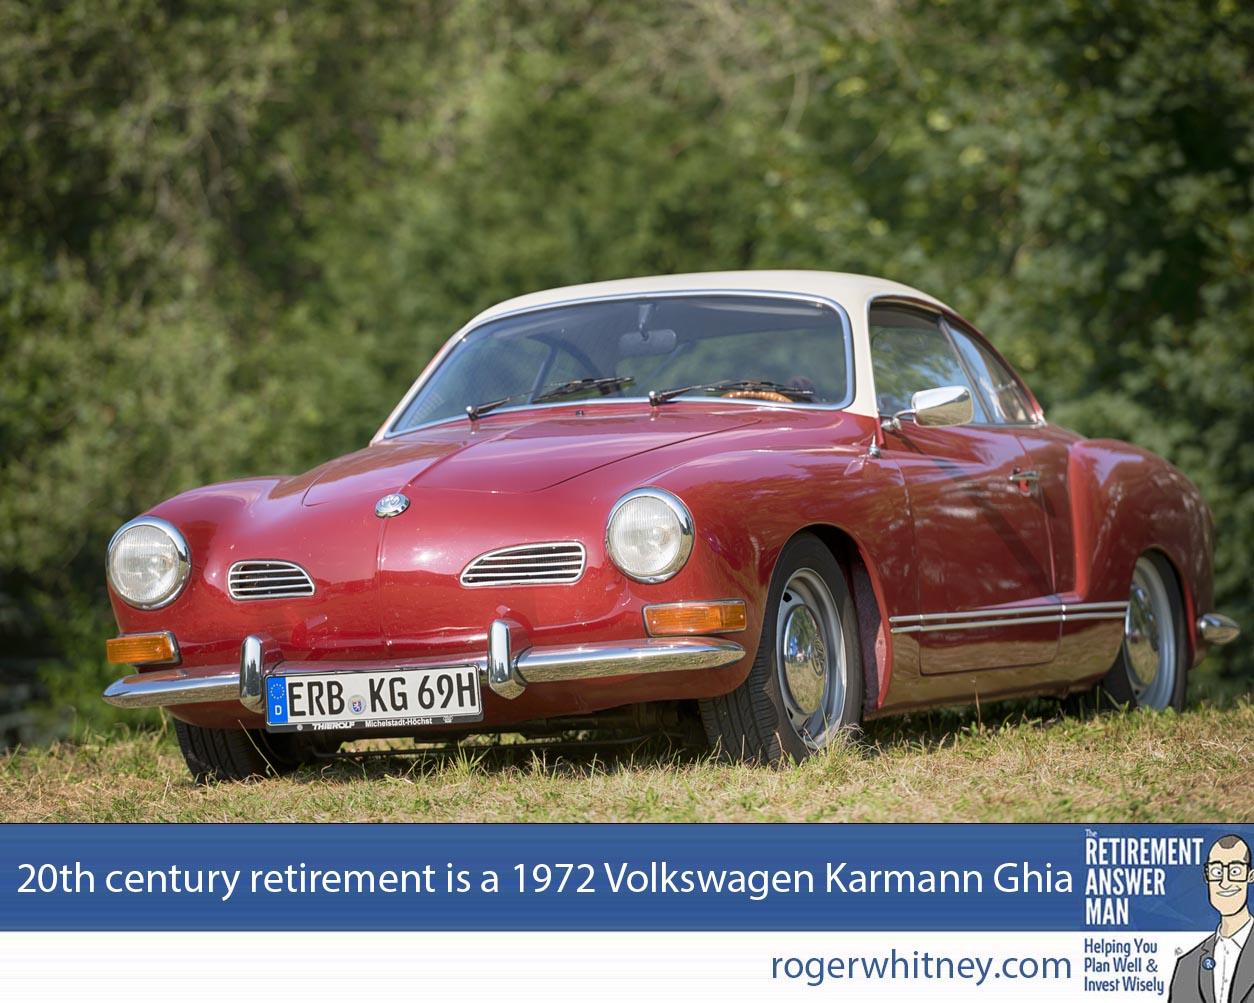 92959bc8b12f10 20th century retirement is a 1972 Volkswagen Karmann Ghia — Roger ...